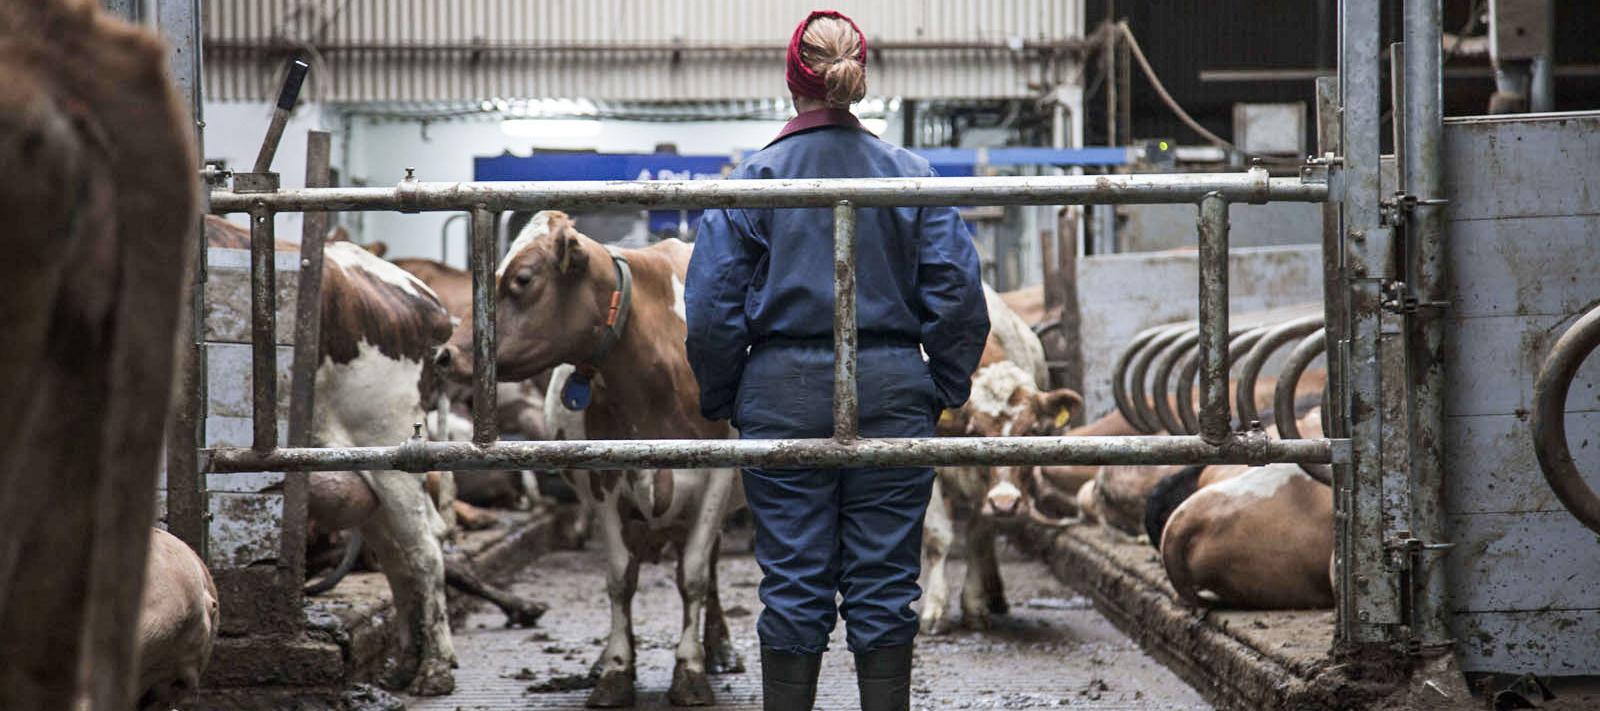 Film-Tipp: Milchkrieg in Dalsmynni